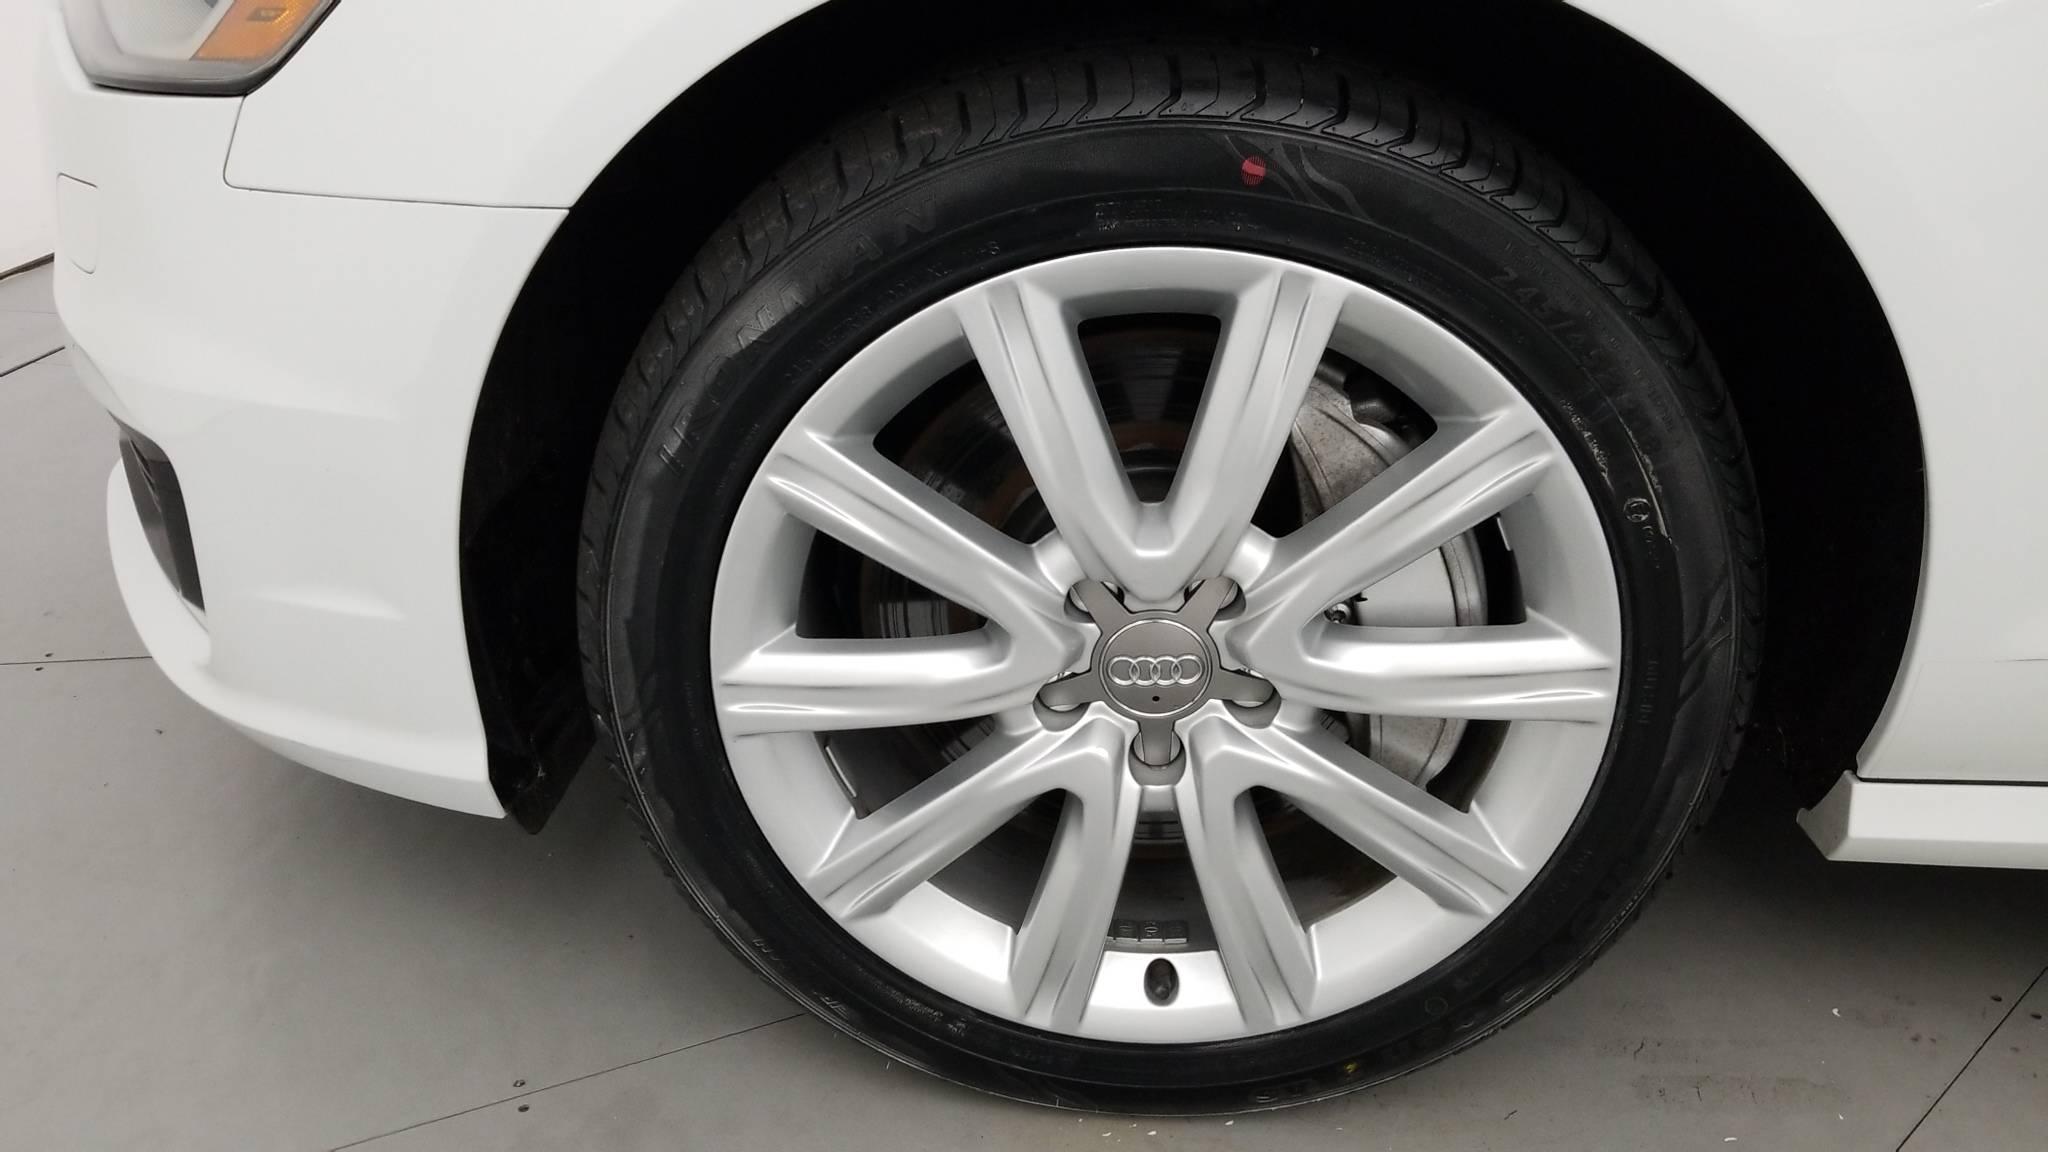 Pre-Owned 2016 Audi A6 2.0T Premium Plus